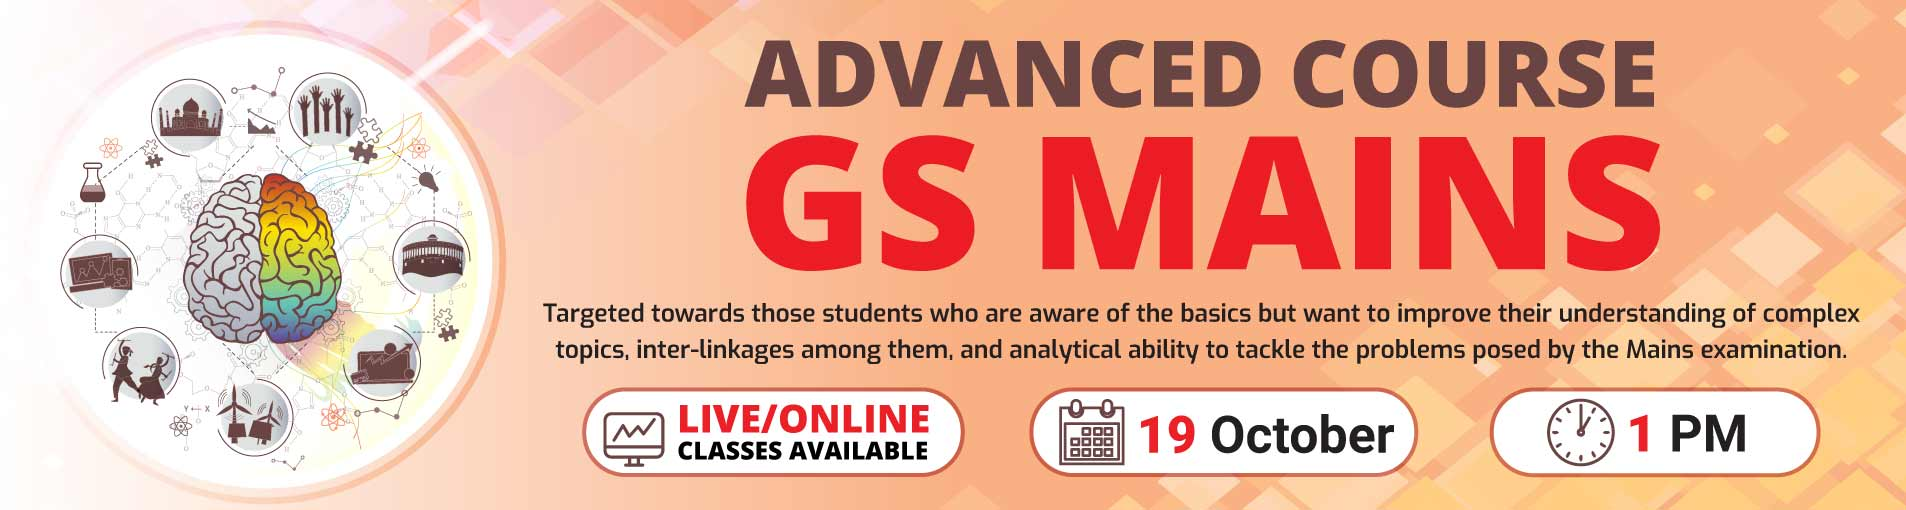 ADVANCED COURSE GS MAINS